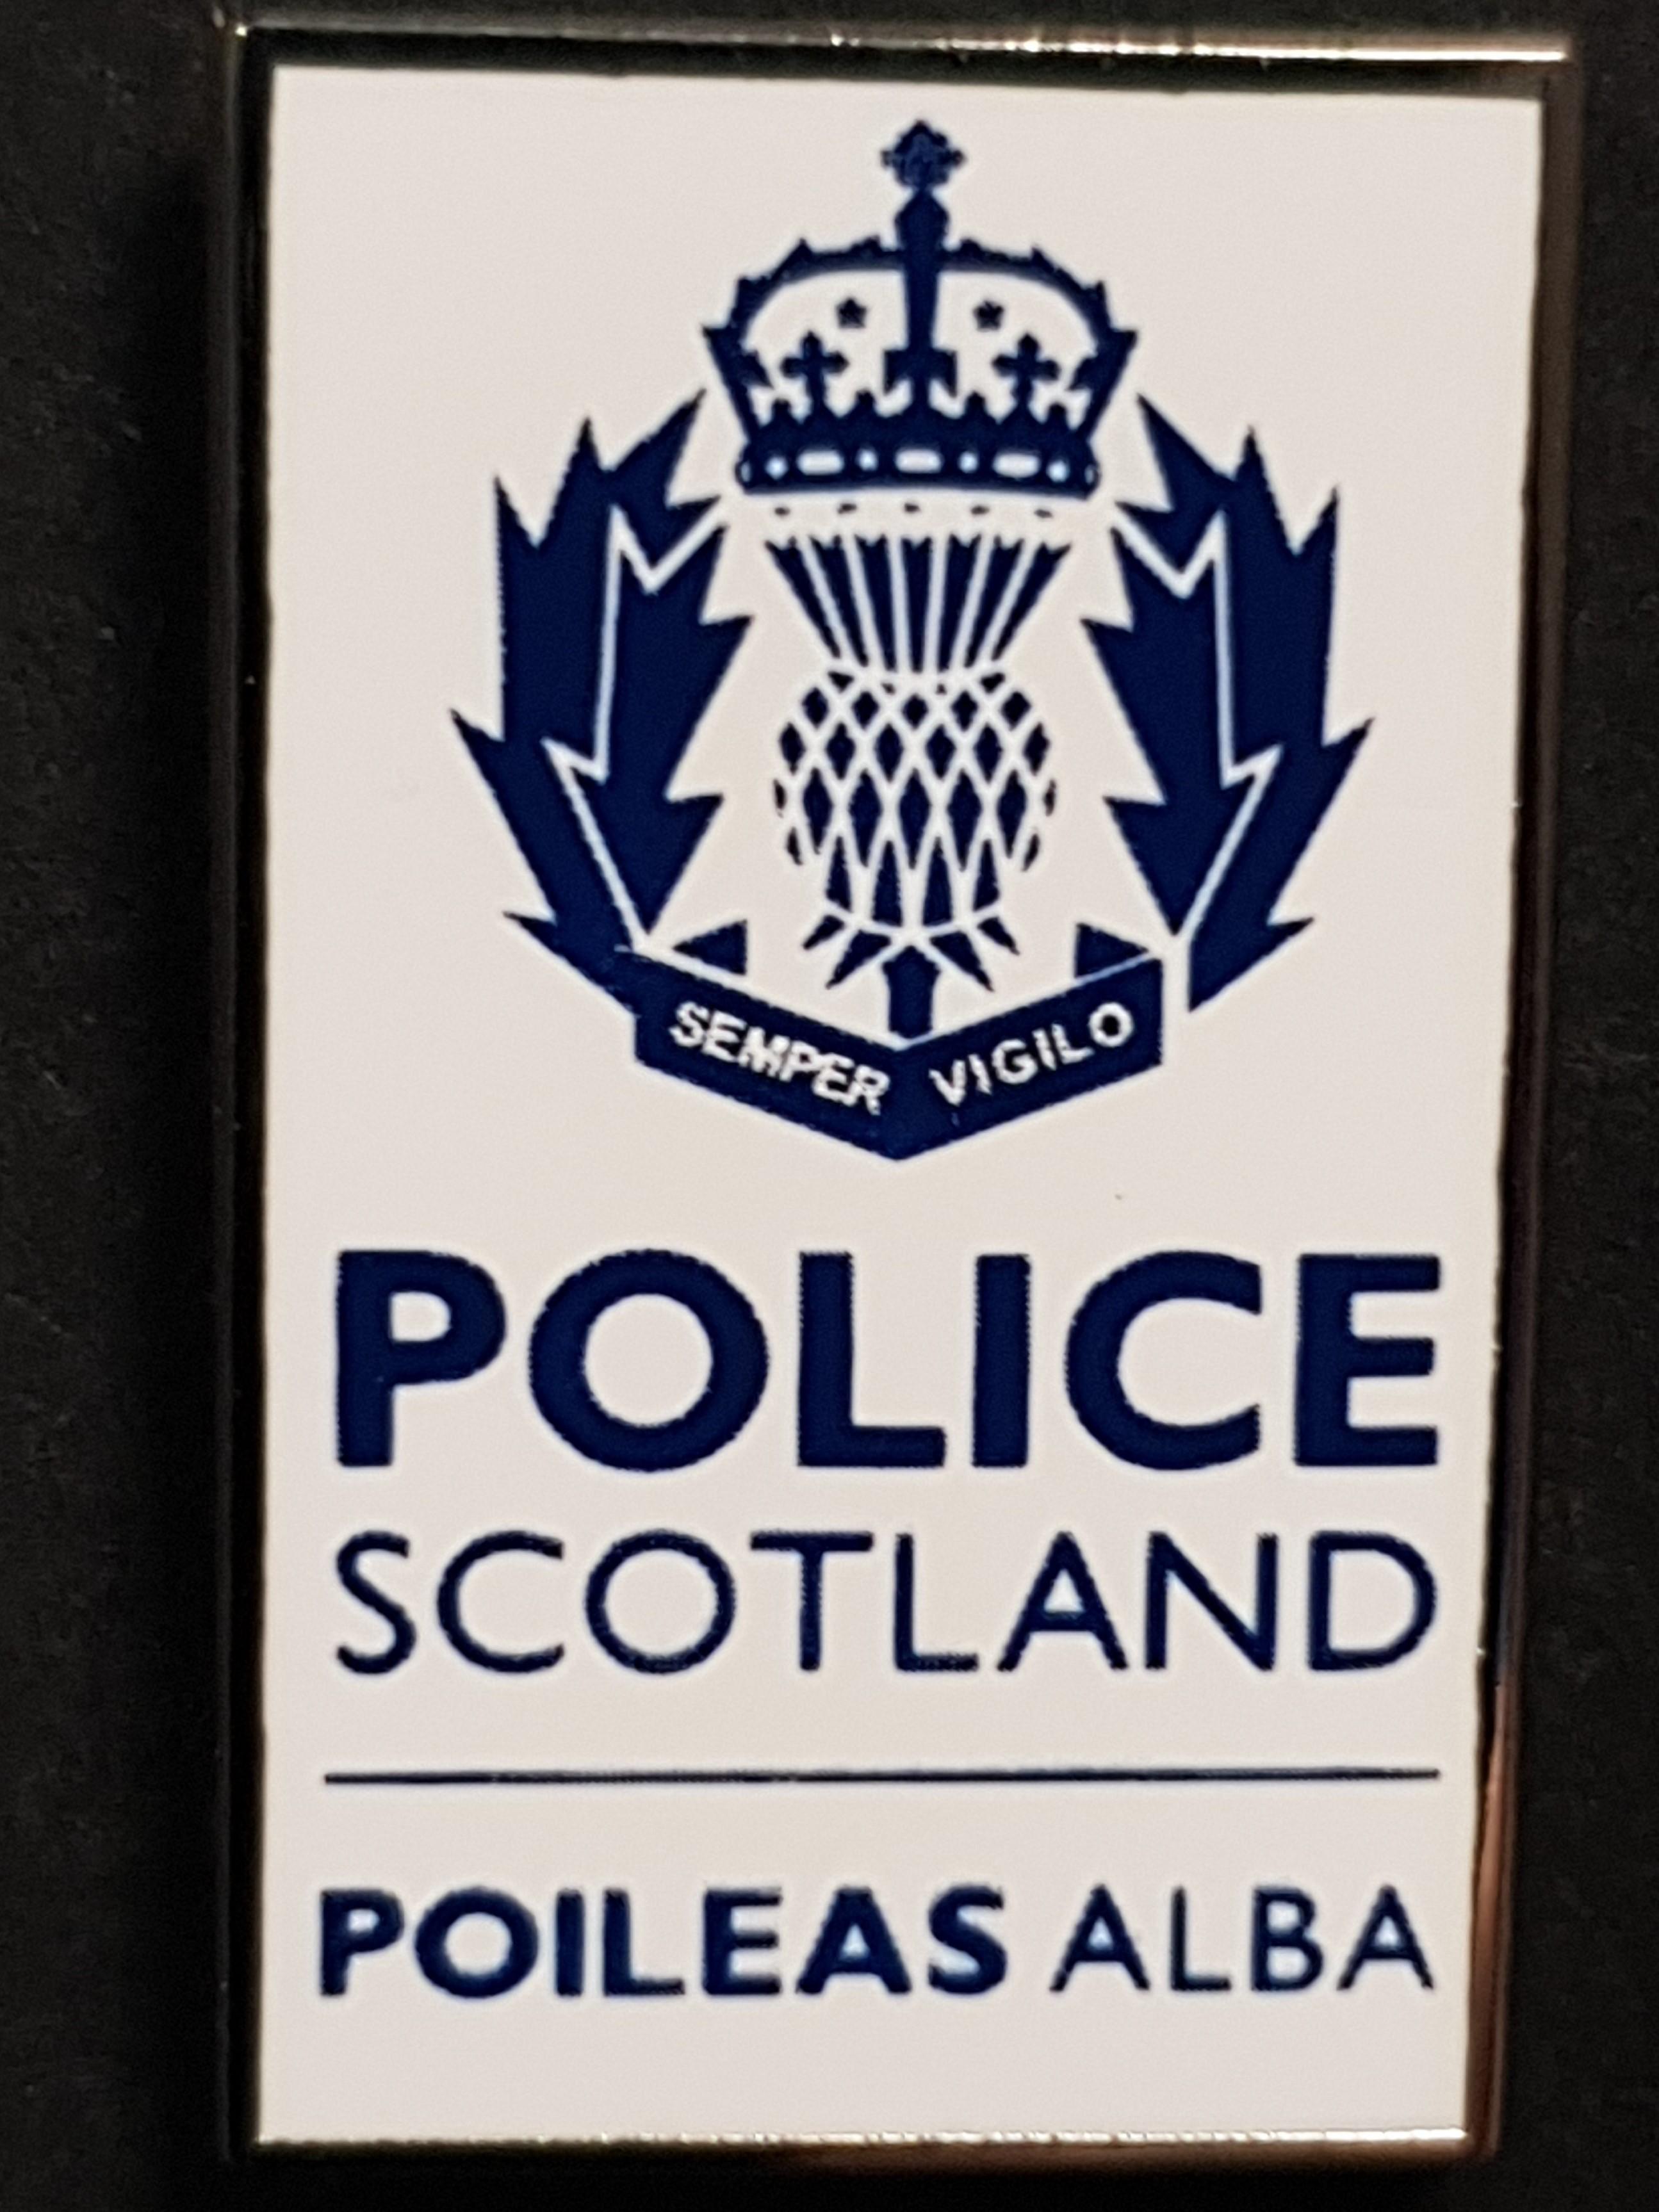 TIE PIN POLICE SCOTLAND 019334f25